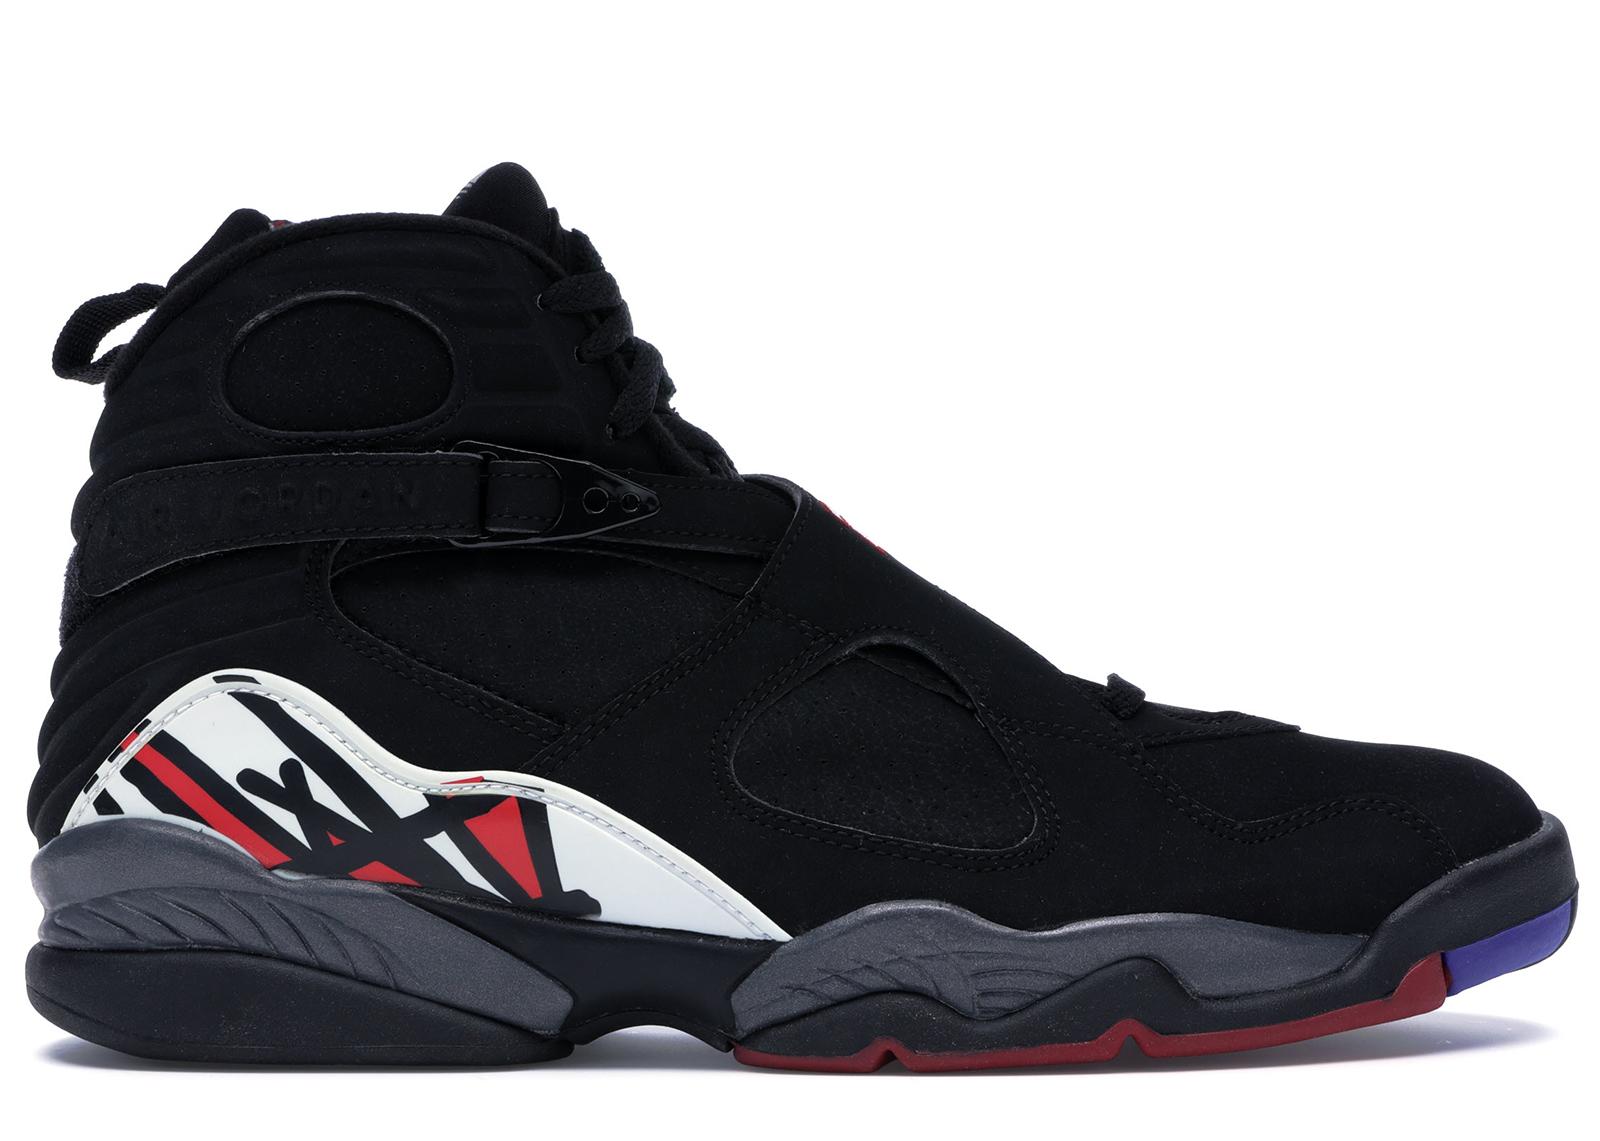 Buy Air Jordan 8 Shoes \u0026 Deadstock Sneakers